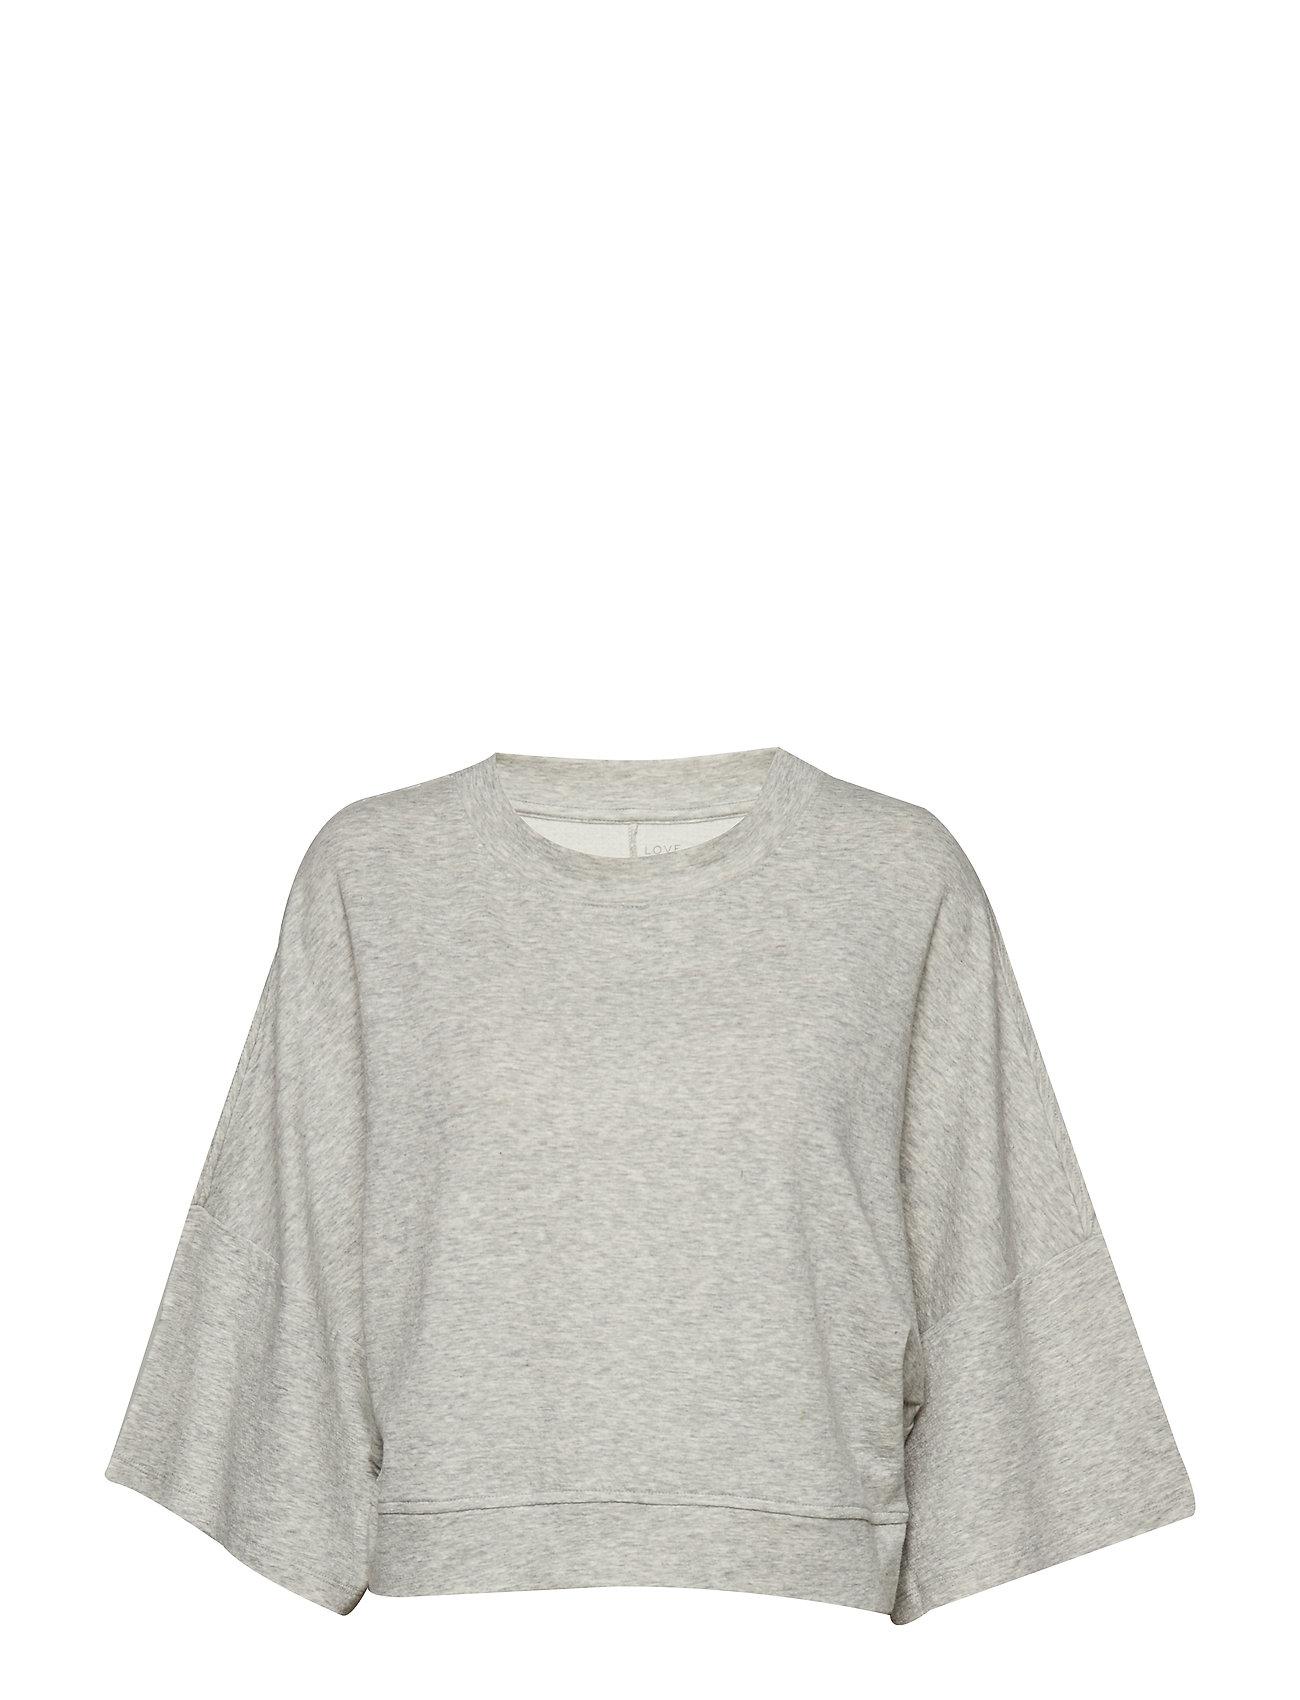 GAP Double Knit Wide-Sleeve Crop Pullover Sweatshirt - LIGHT HEATHER GREY